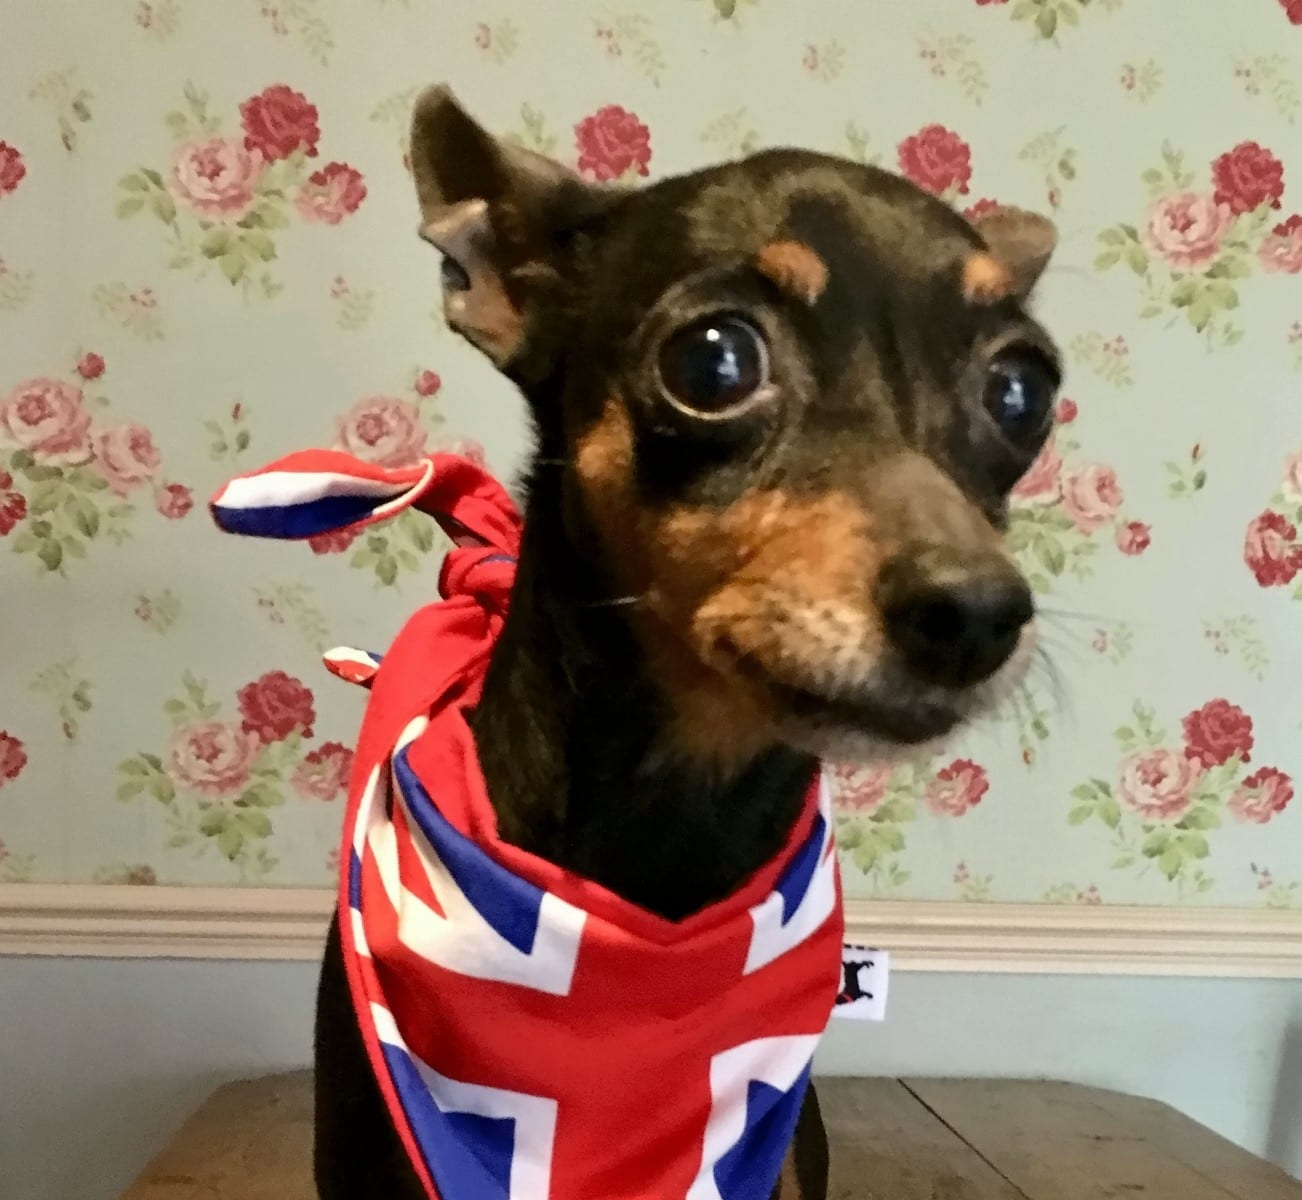 Huge £11,000 Reward Offered For Safe Return Of Beloved Pet Dog – 'Stolen' From Home As Owners Watched TV